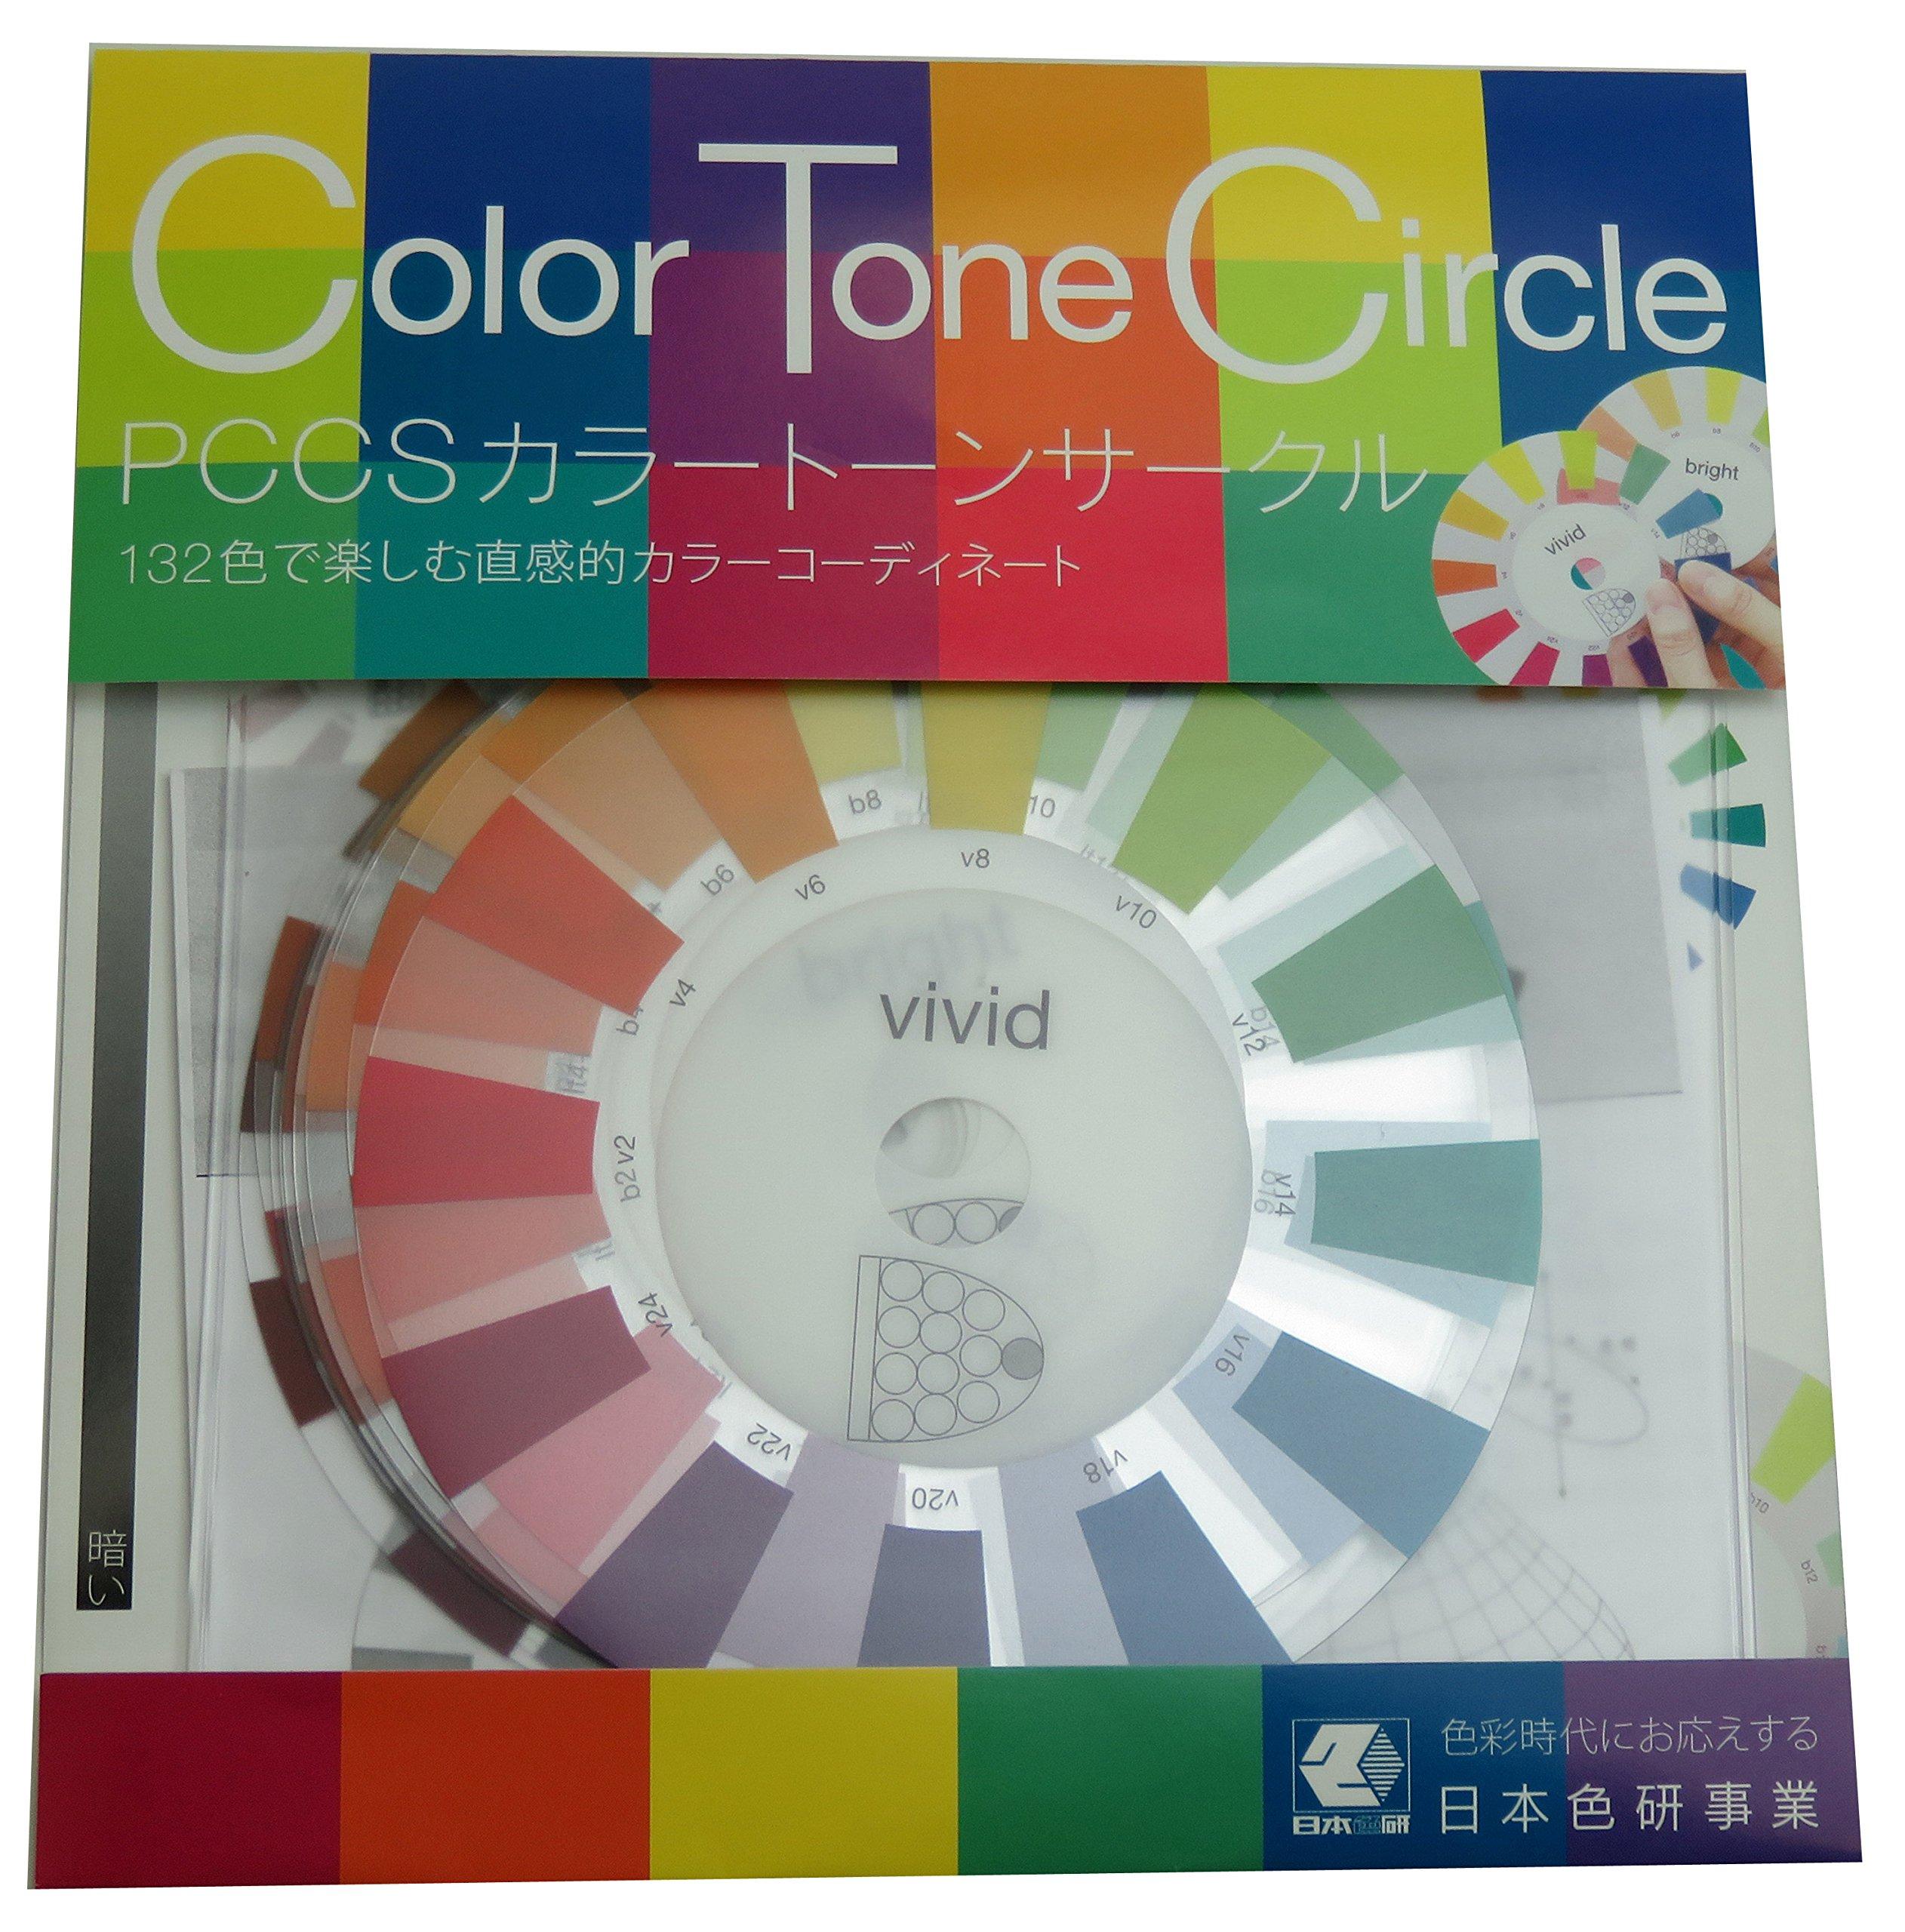 Japan Iroken PCCS color tone Circle by Japan Iroken business